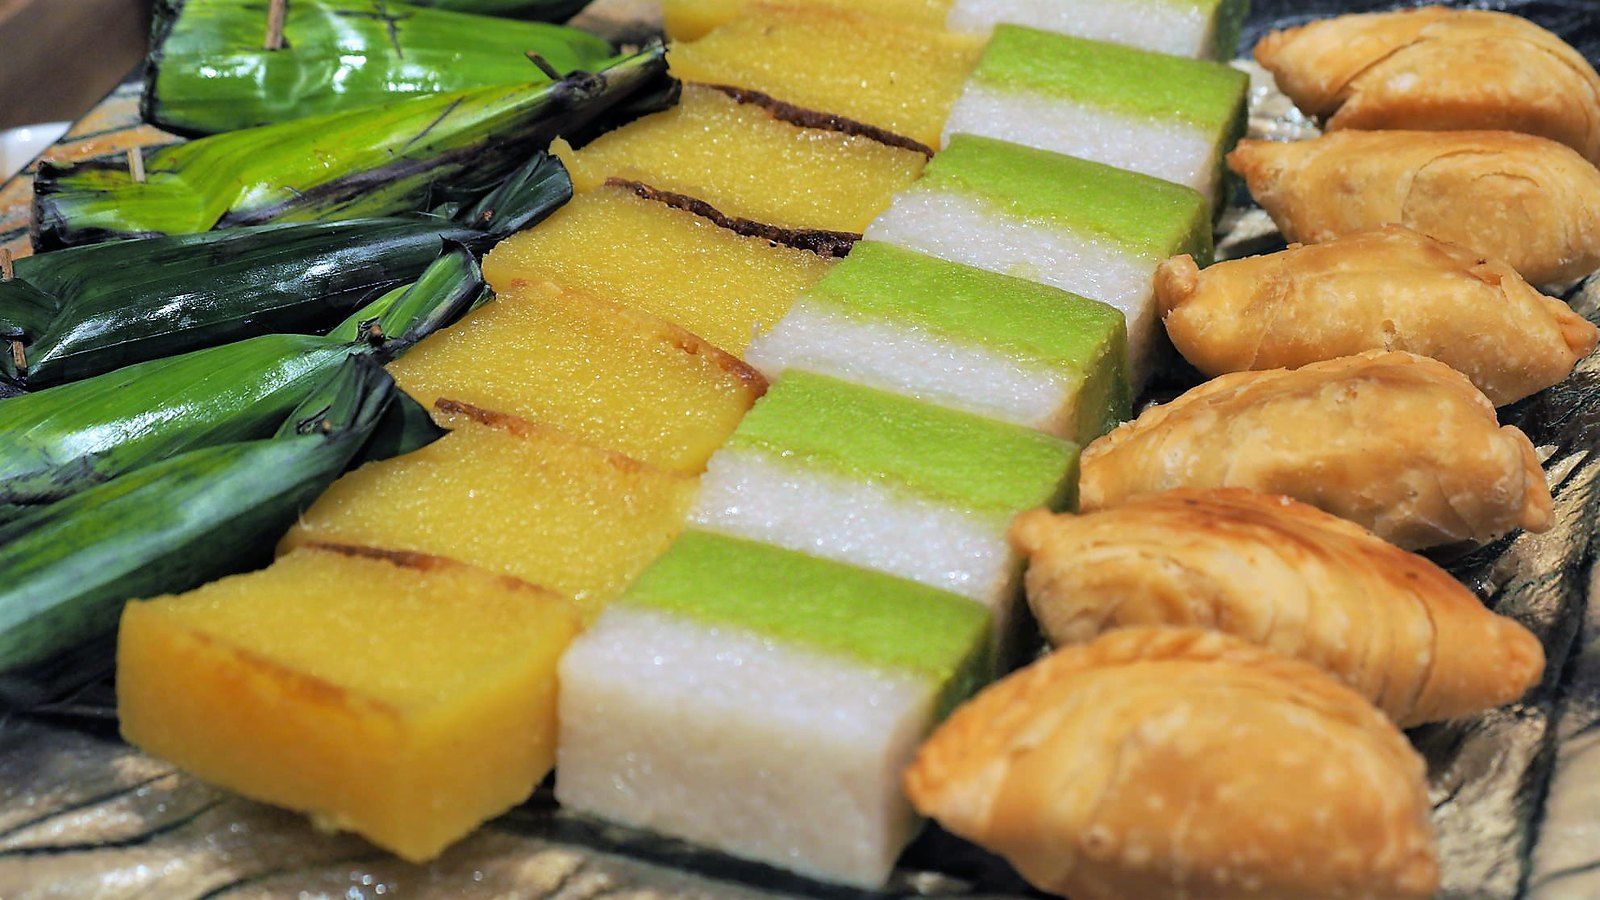 Malay local kuih